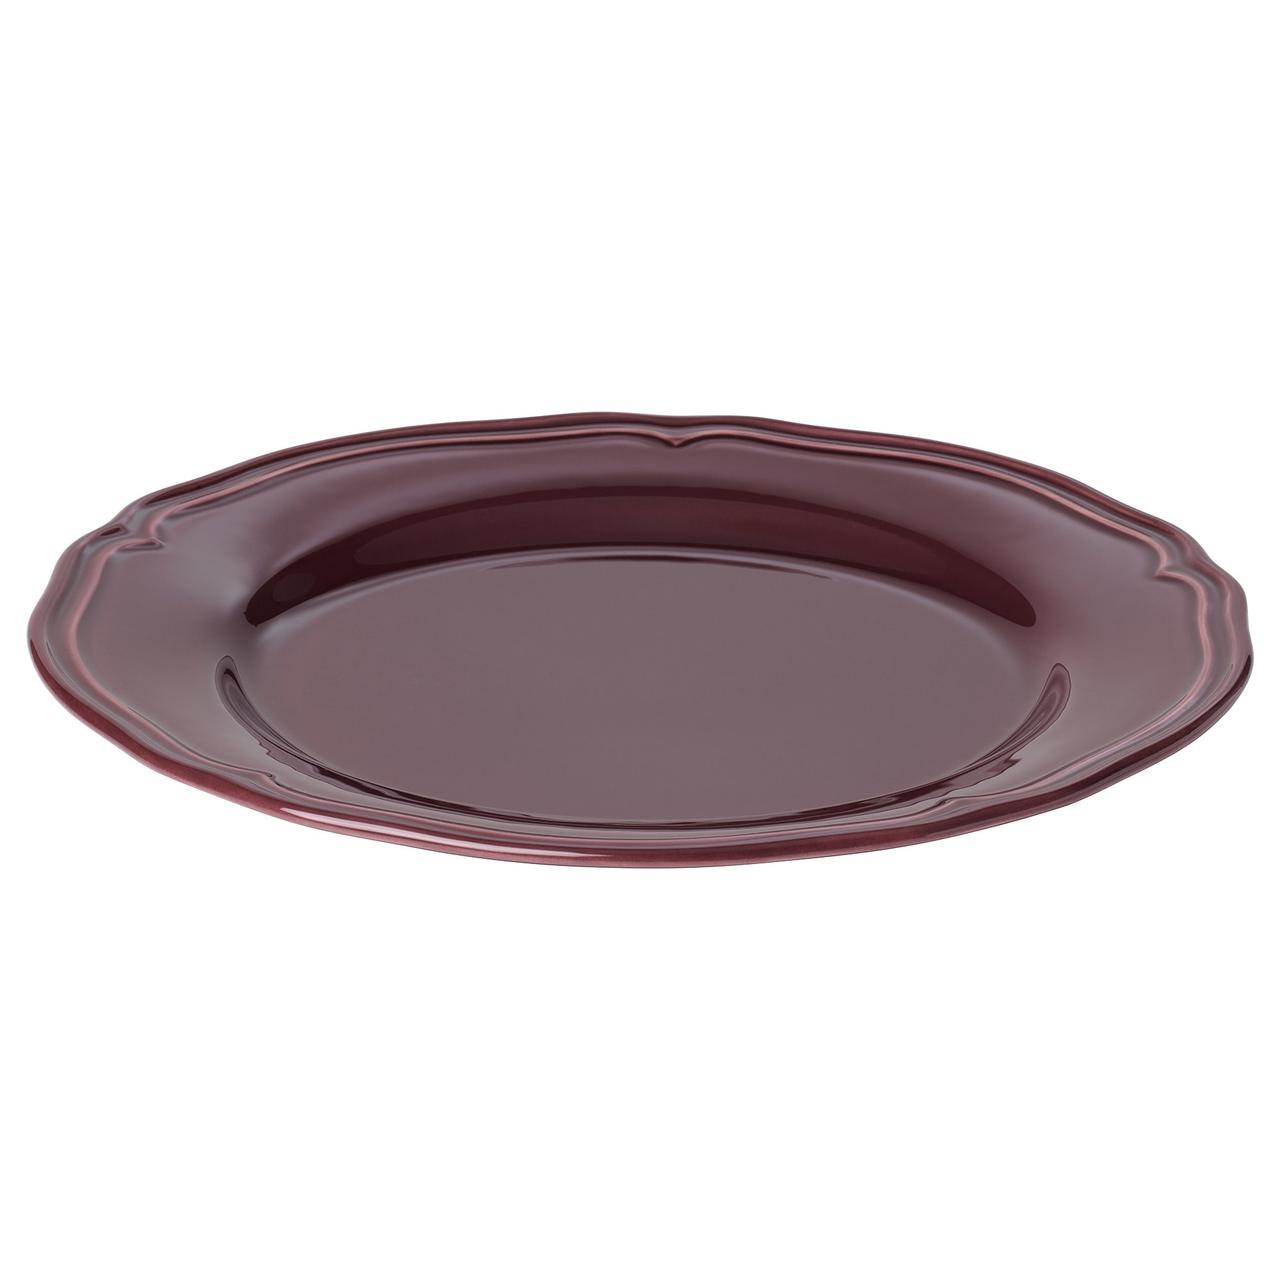 АРВ Тарелка, фиолетовый